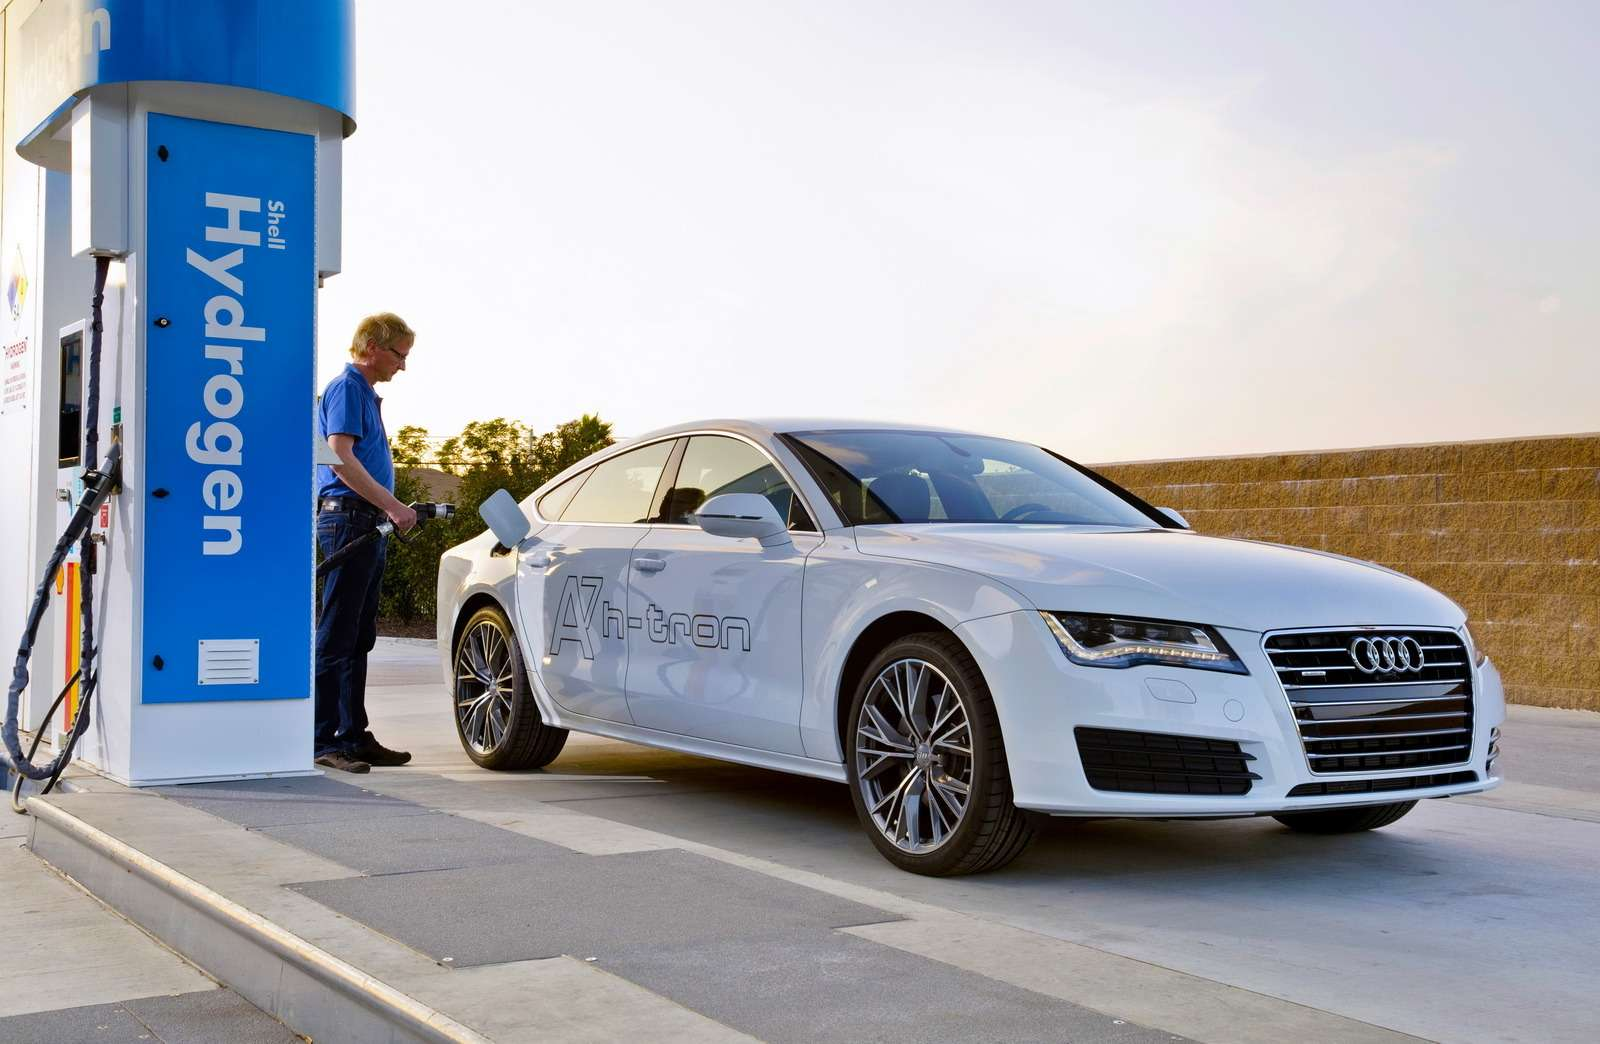 Audi A7Sportback h-tron quattro